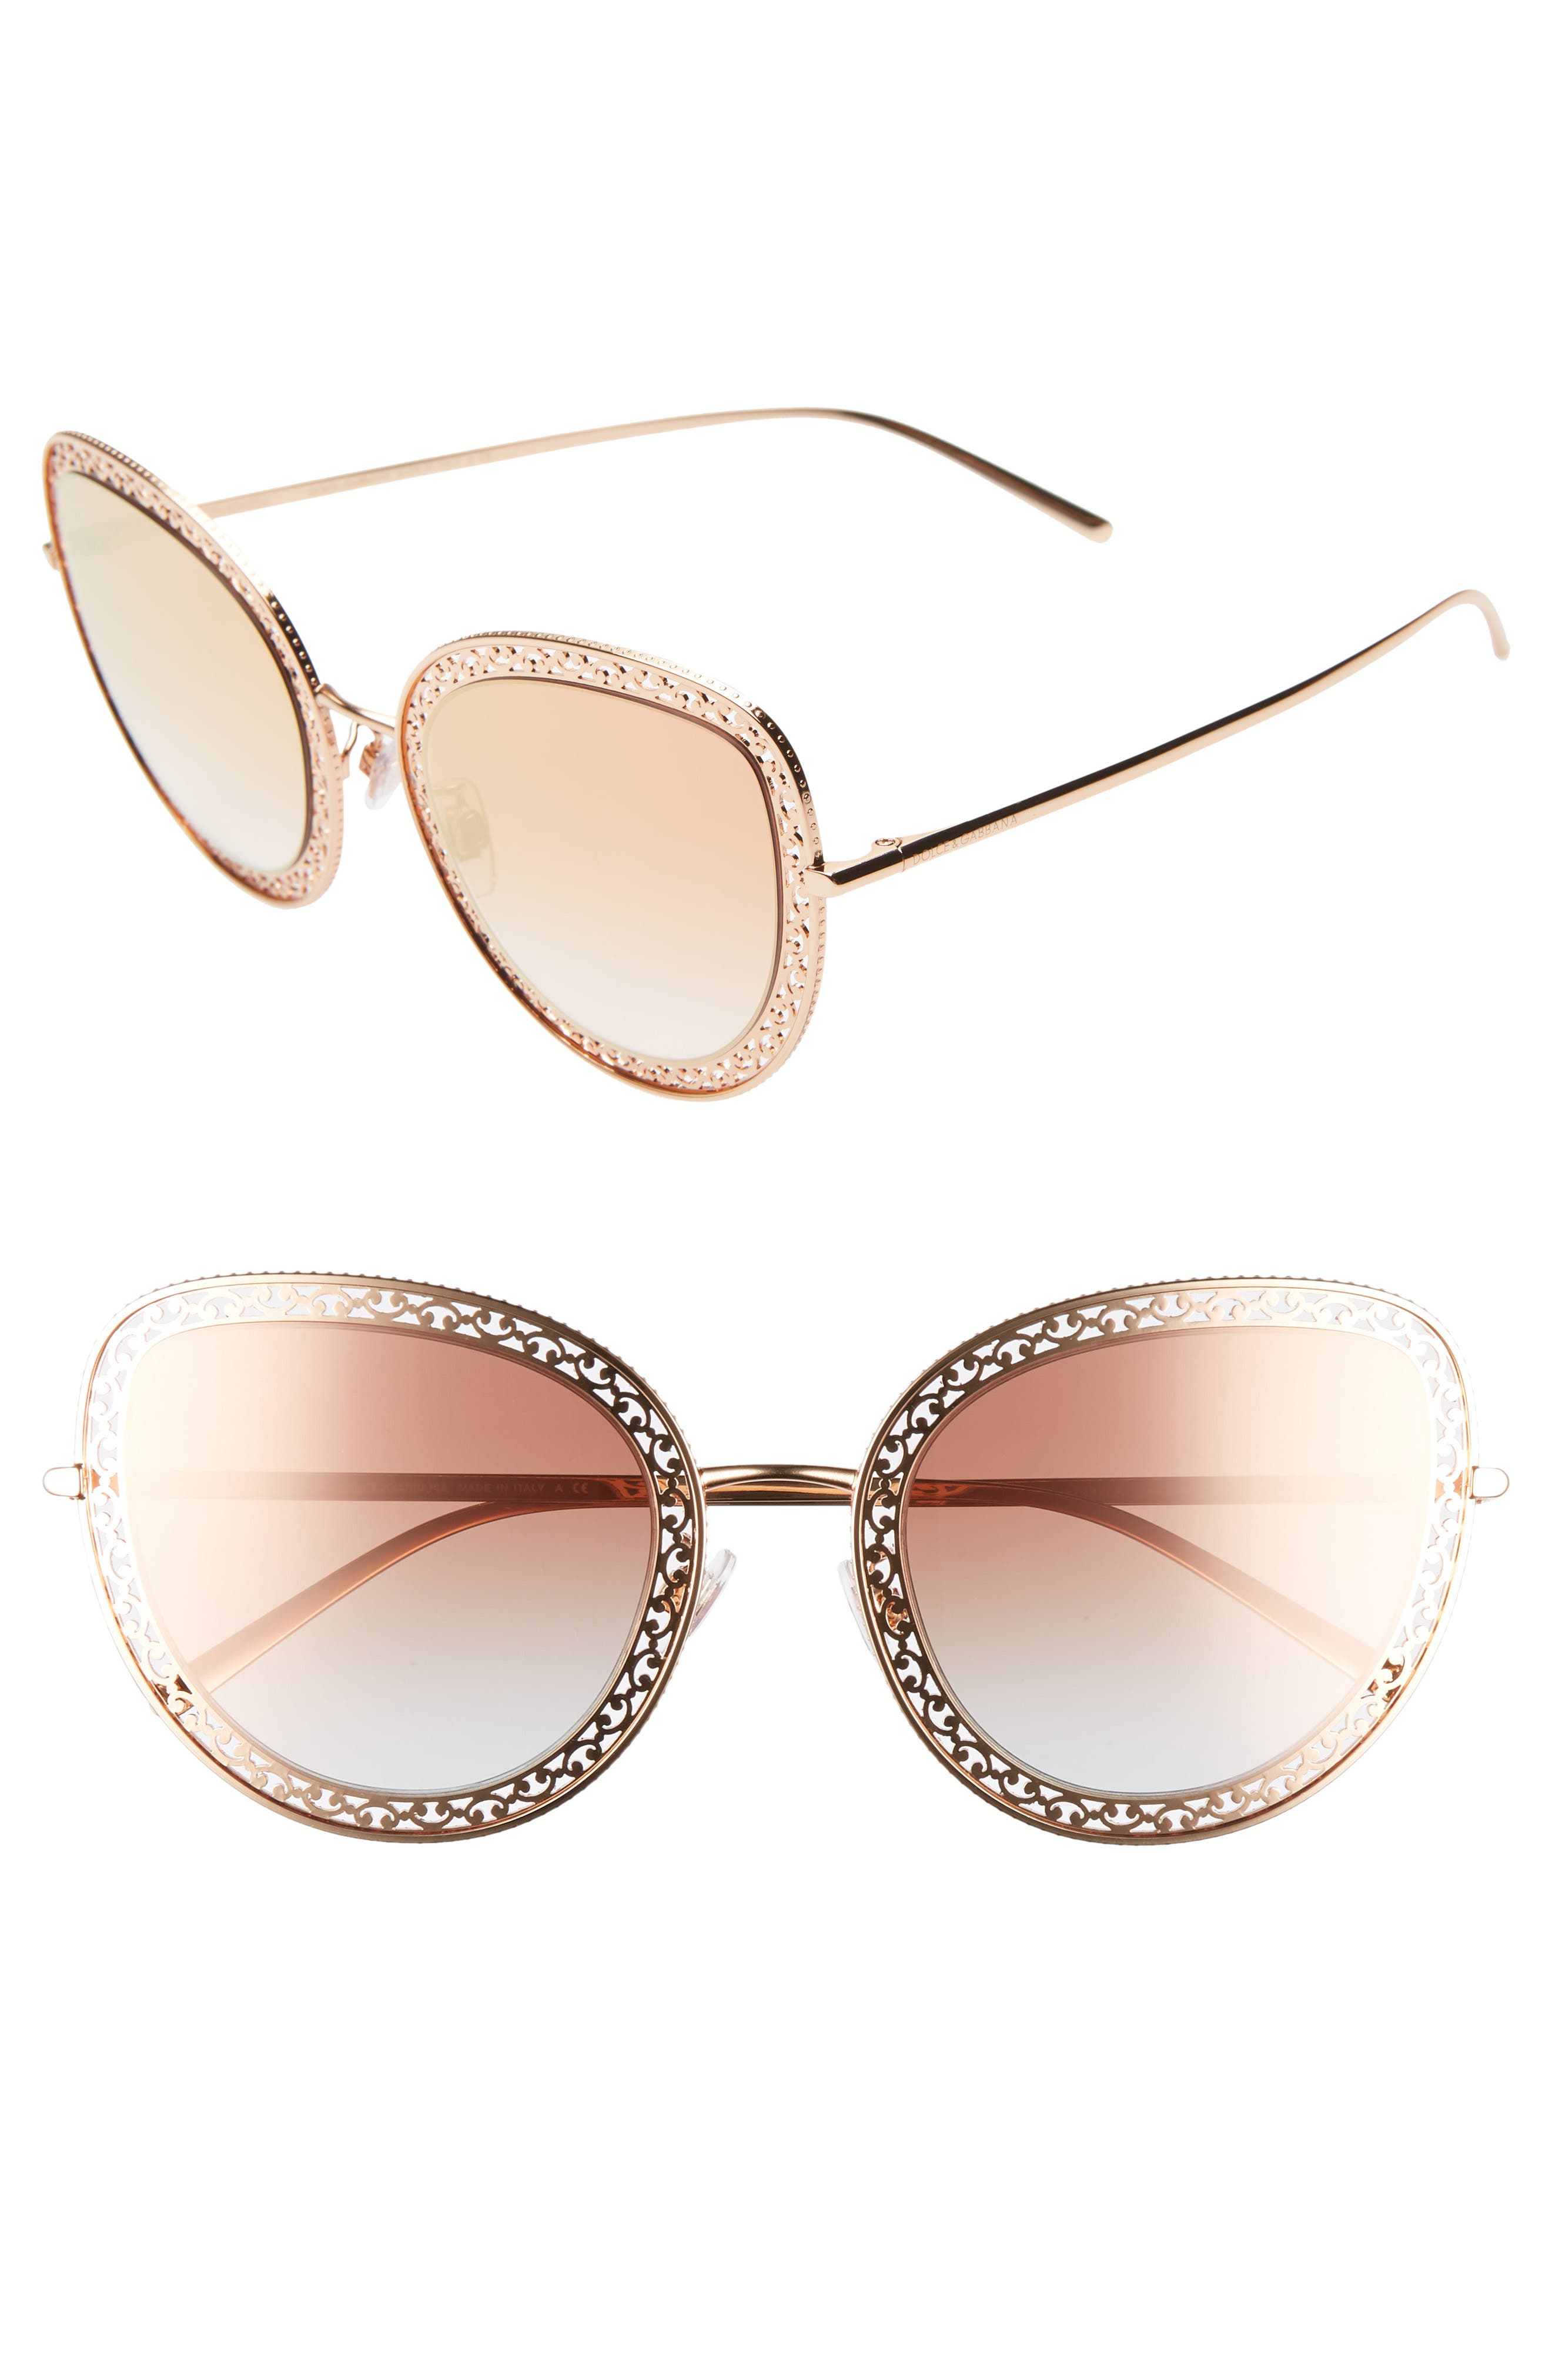 Dolce & gabbana 5m Cat Eye Sunglasses - Gold/ Pink